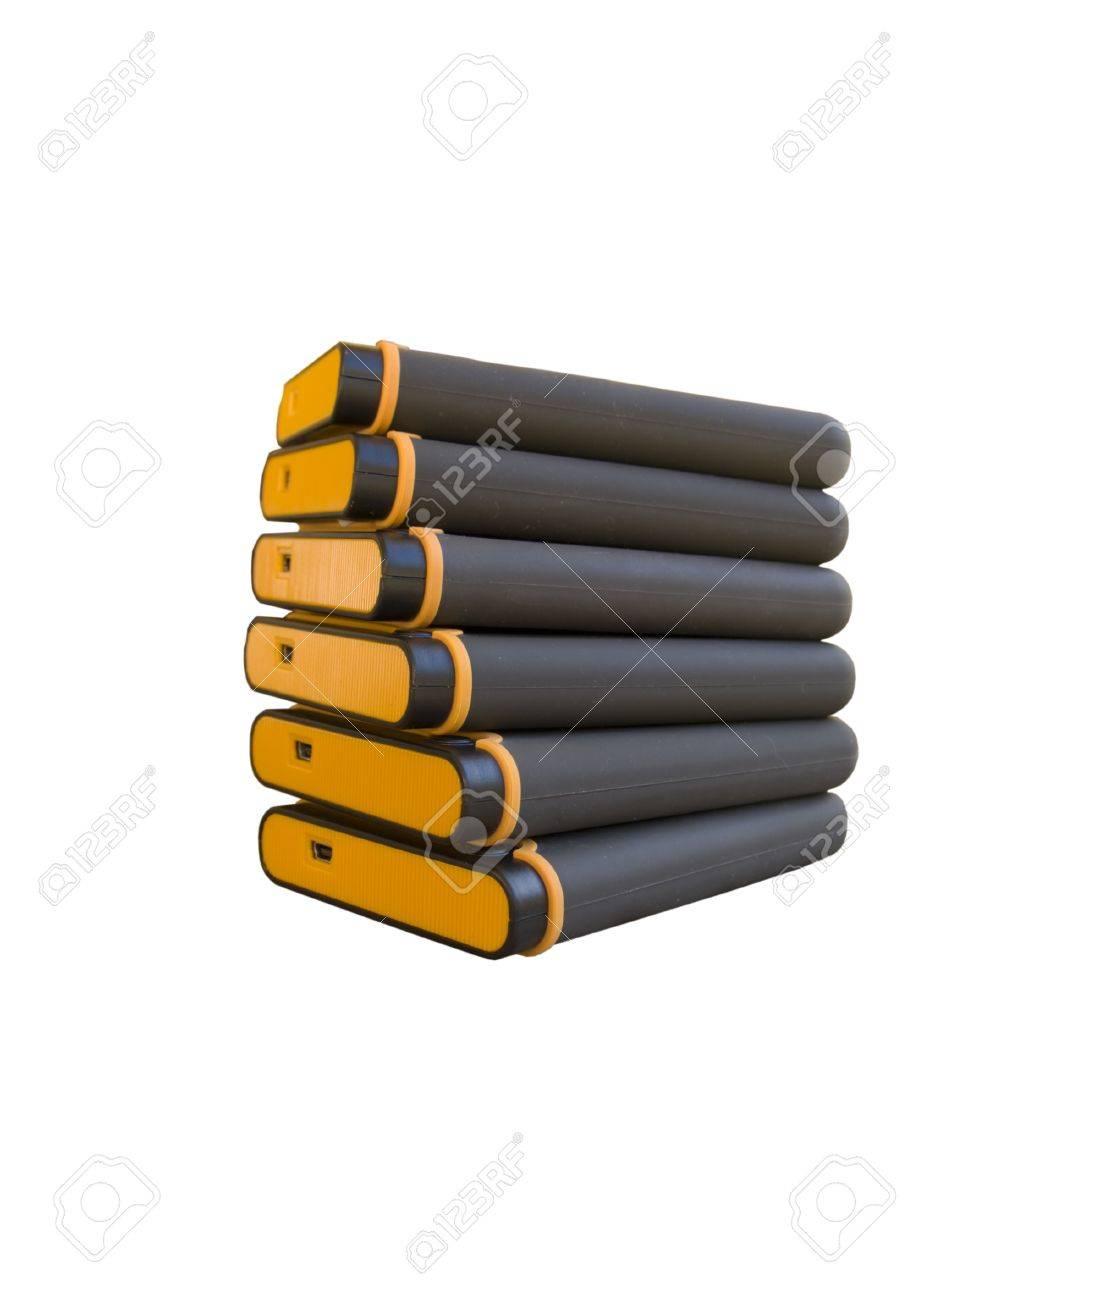 stack of usb hard drives Stock Photo - 8668281